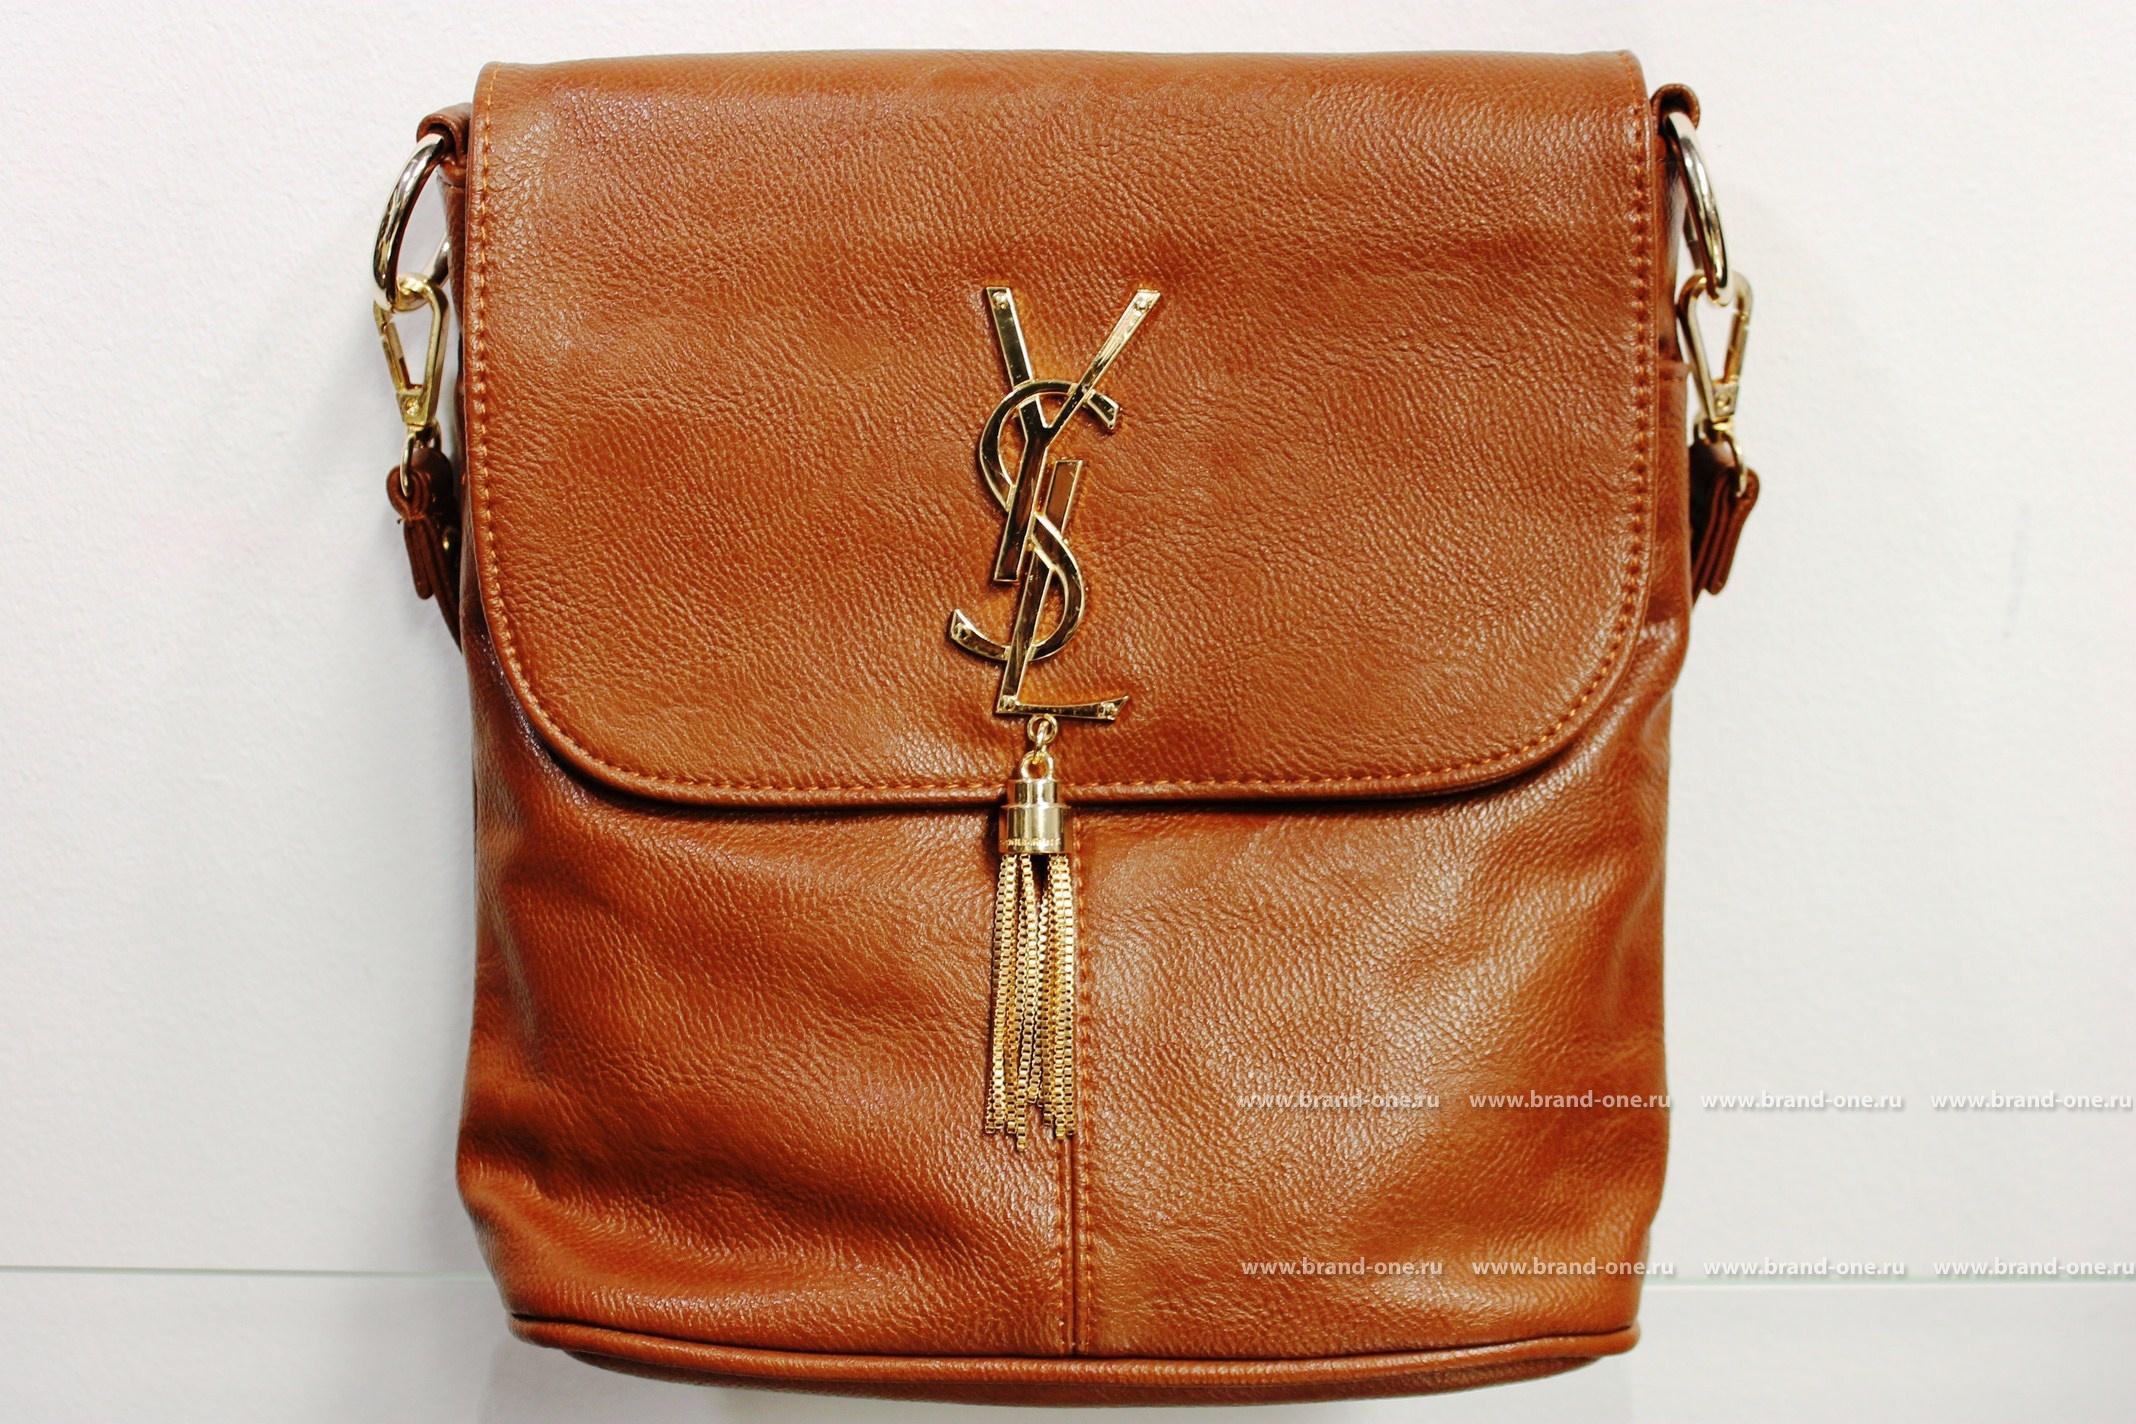 Yves Saint Laurent сумка киев : Yves saint laurent